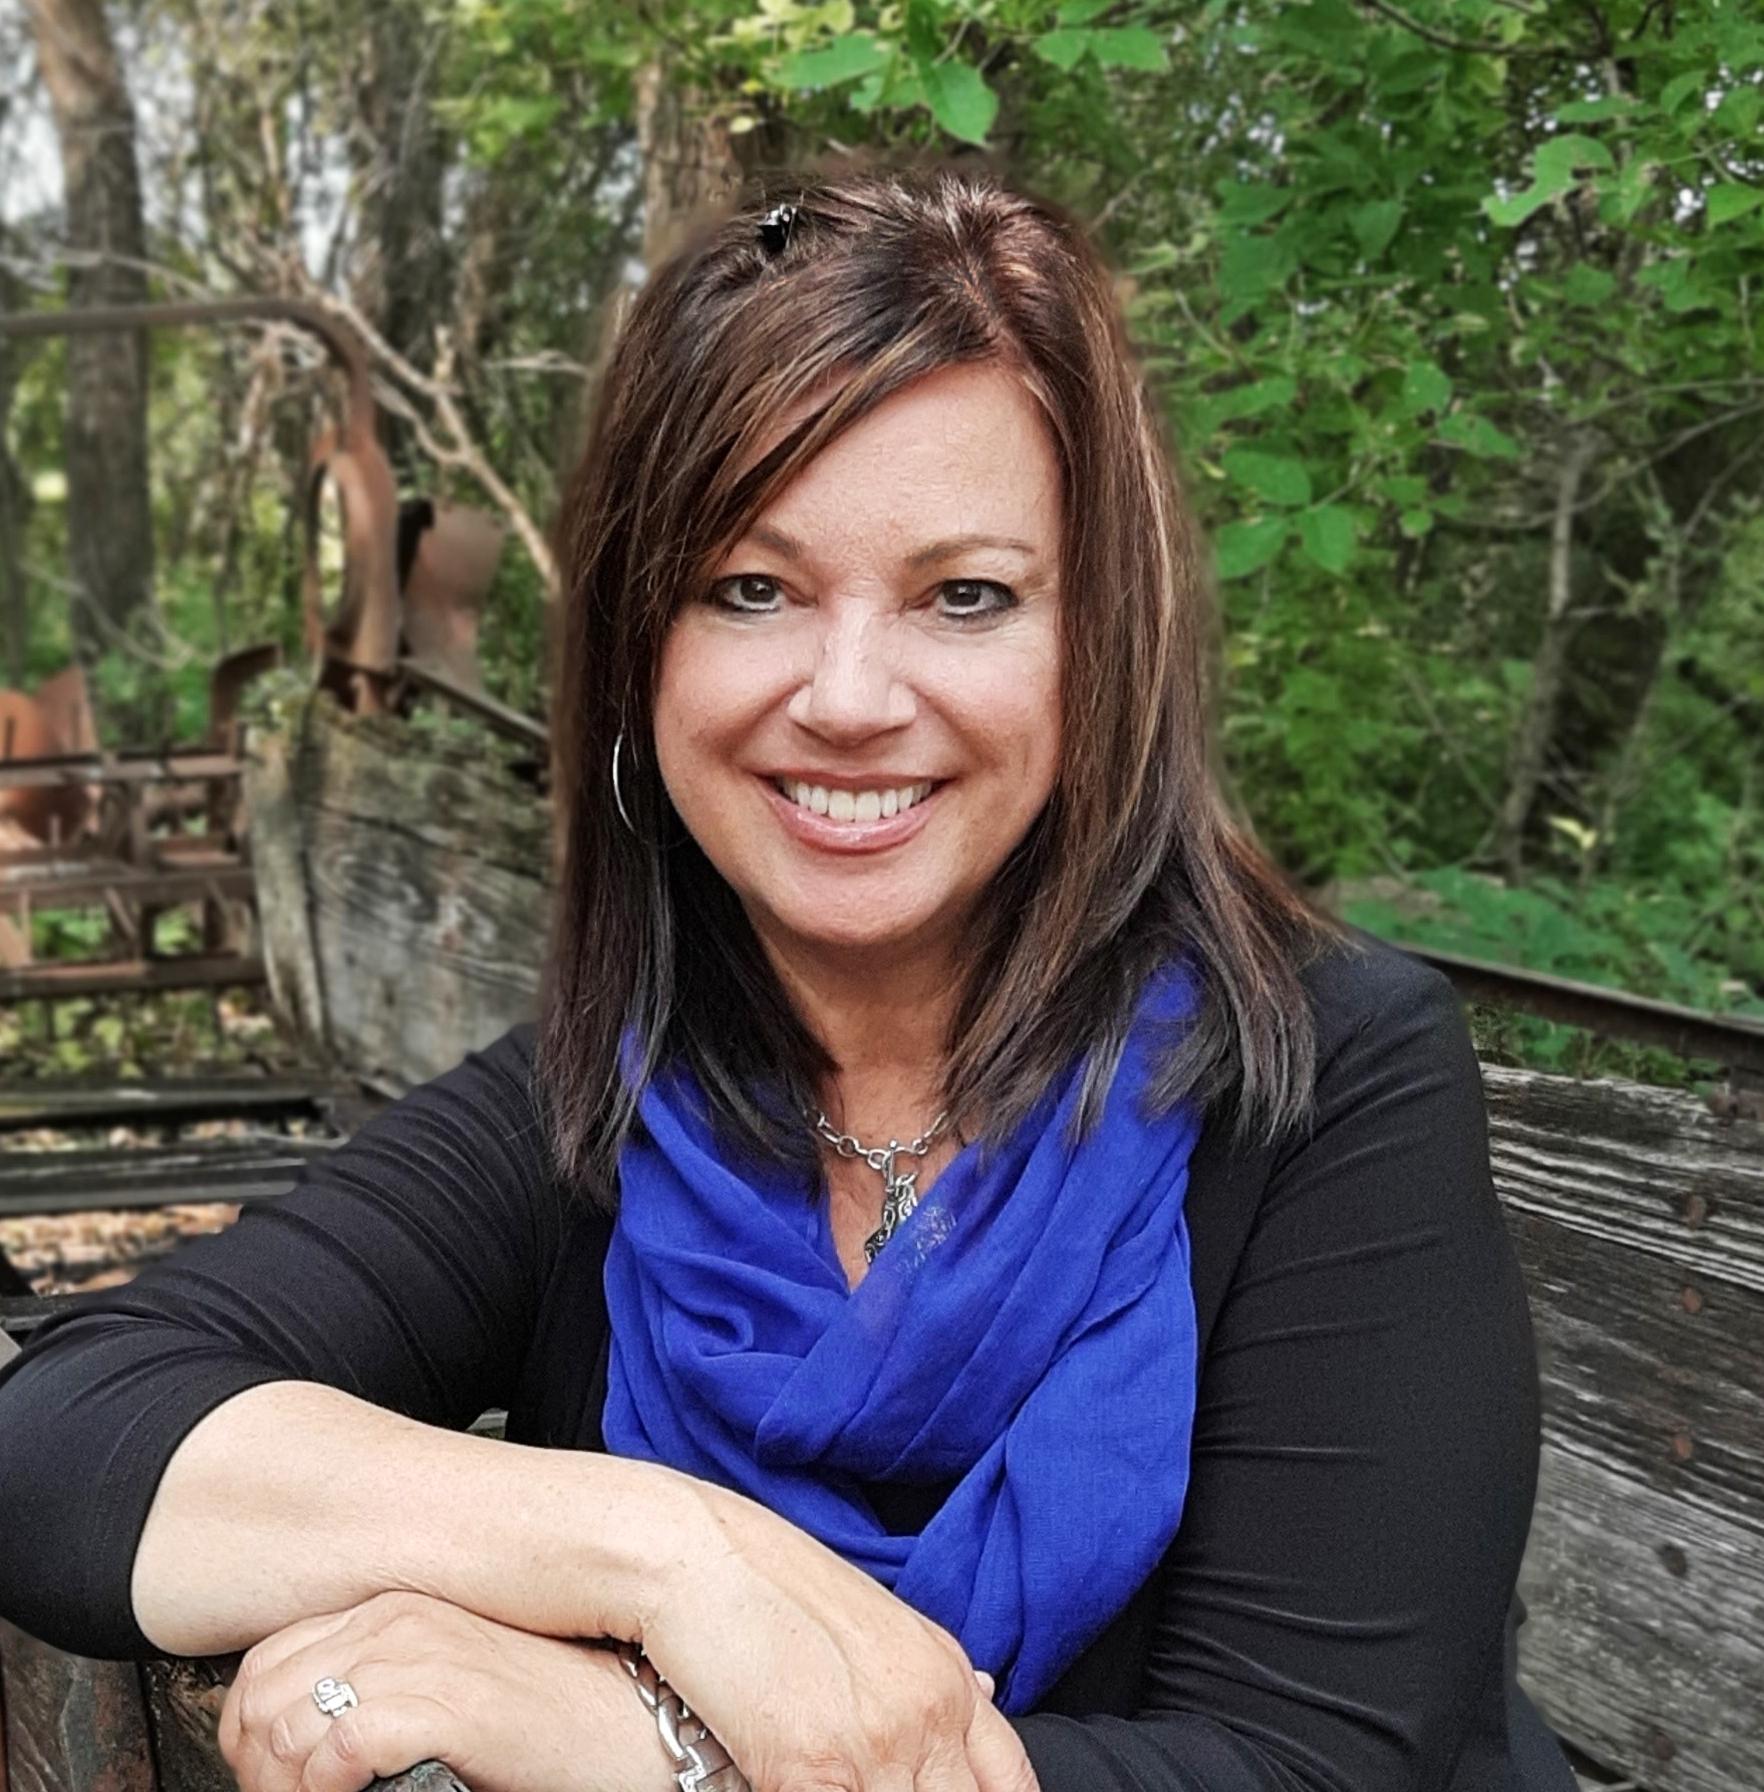 Kathy Weckwerth